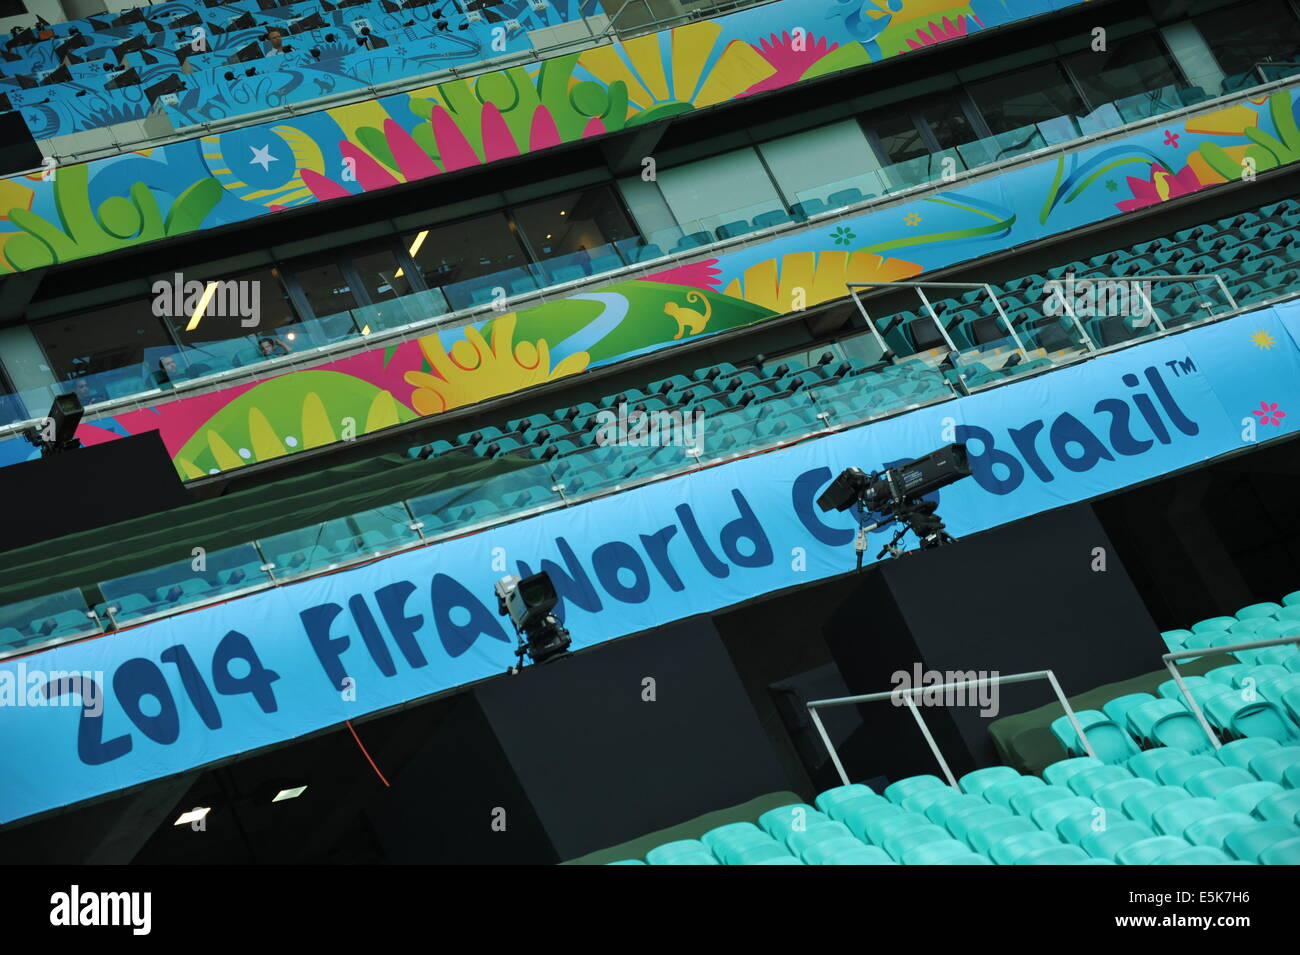 Arena Fonte Nova, Fifa World Cup 2014, Salvador da Bahia, Brazil. Editorial use only. - Stock Image